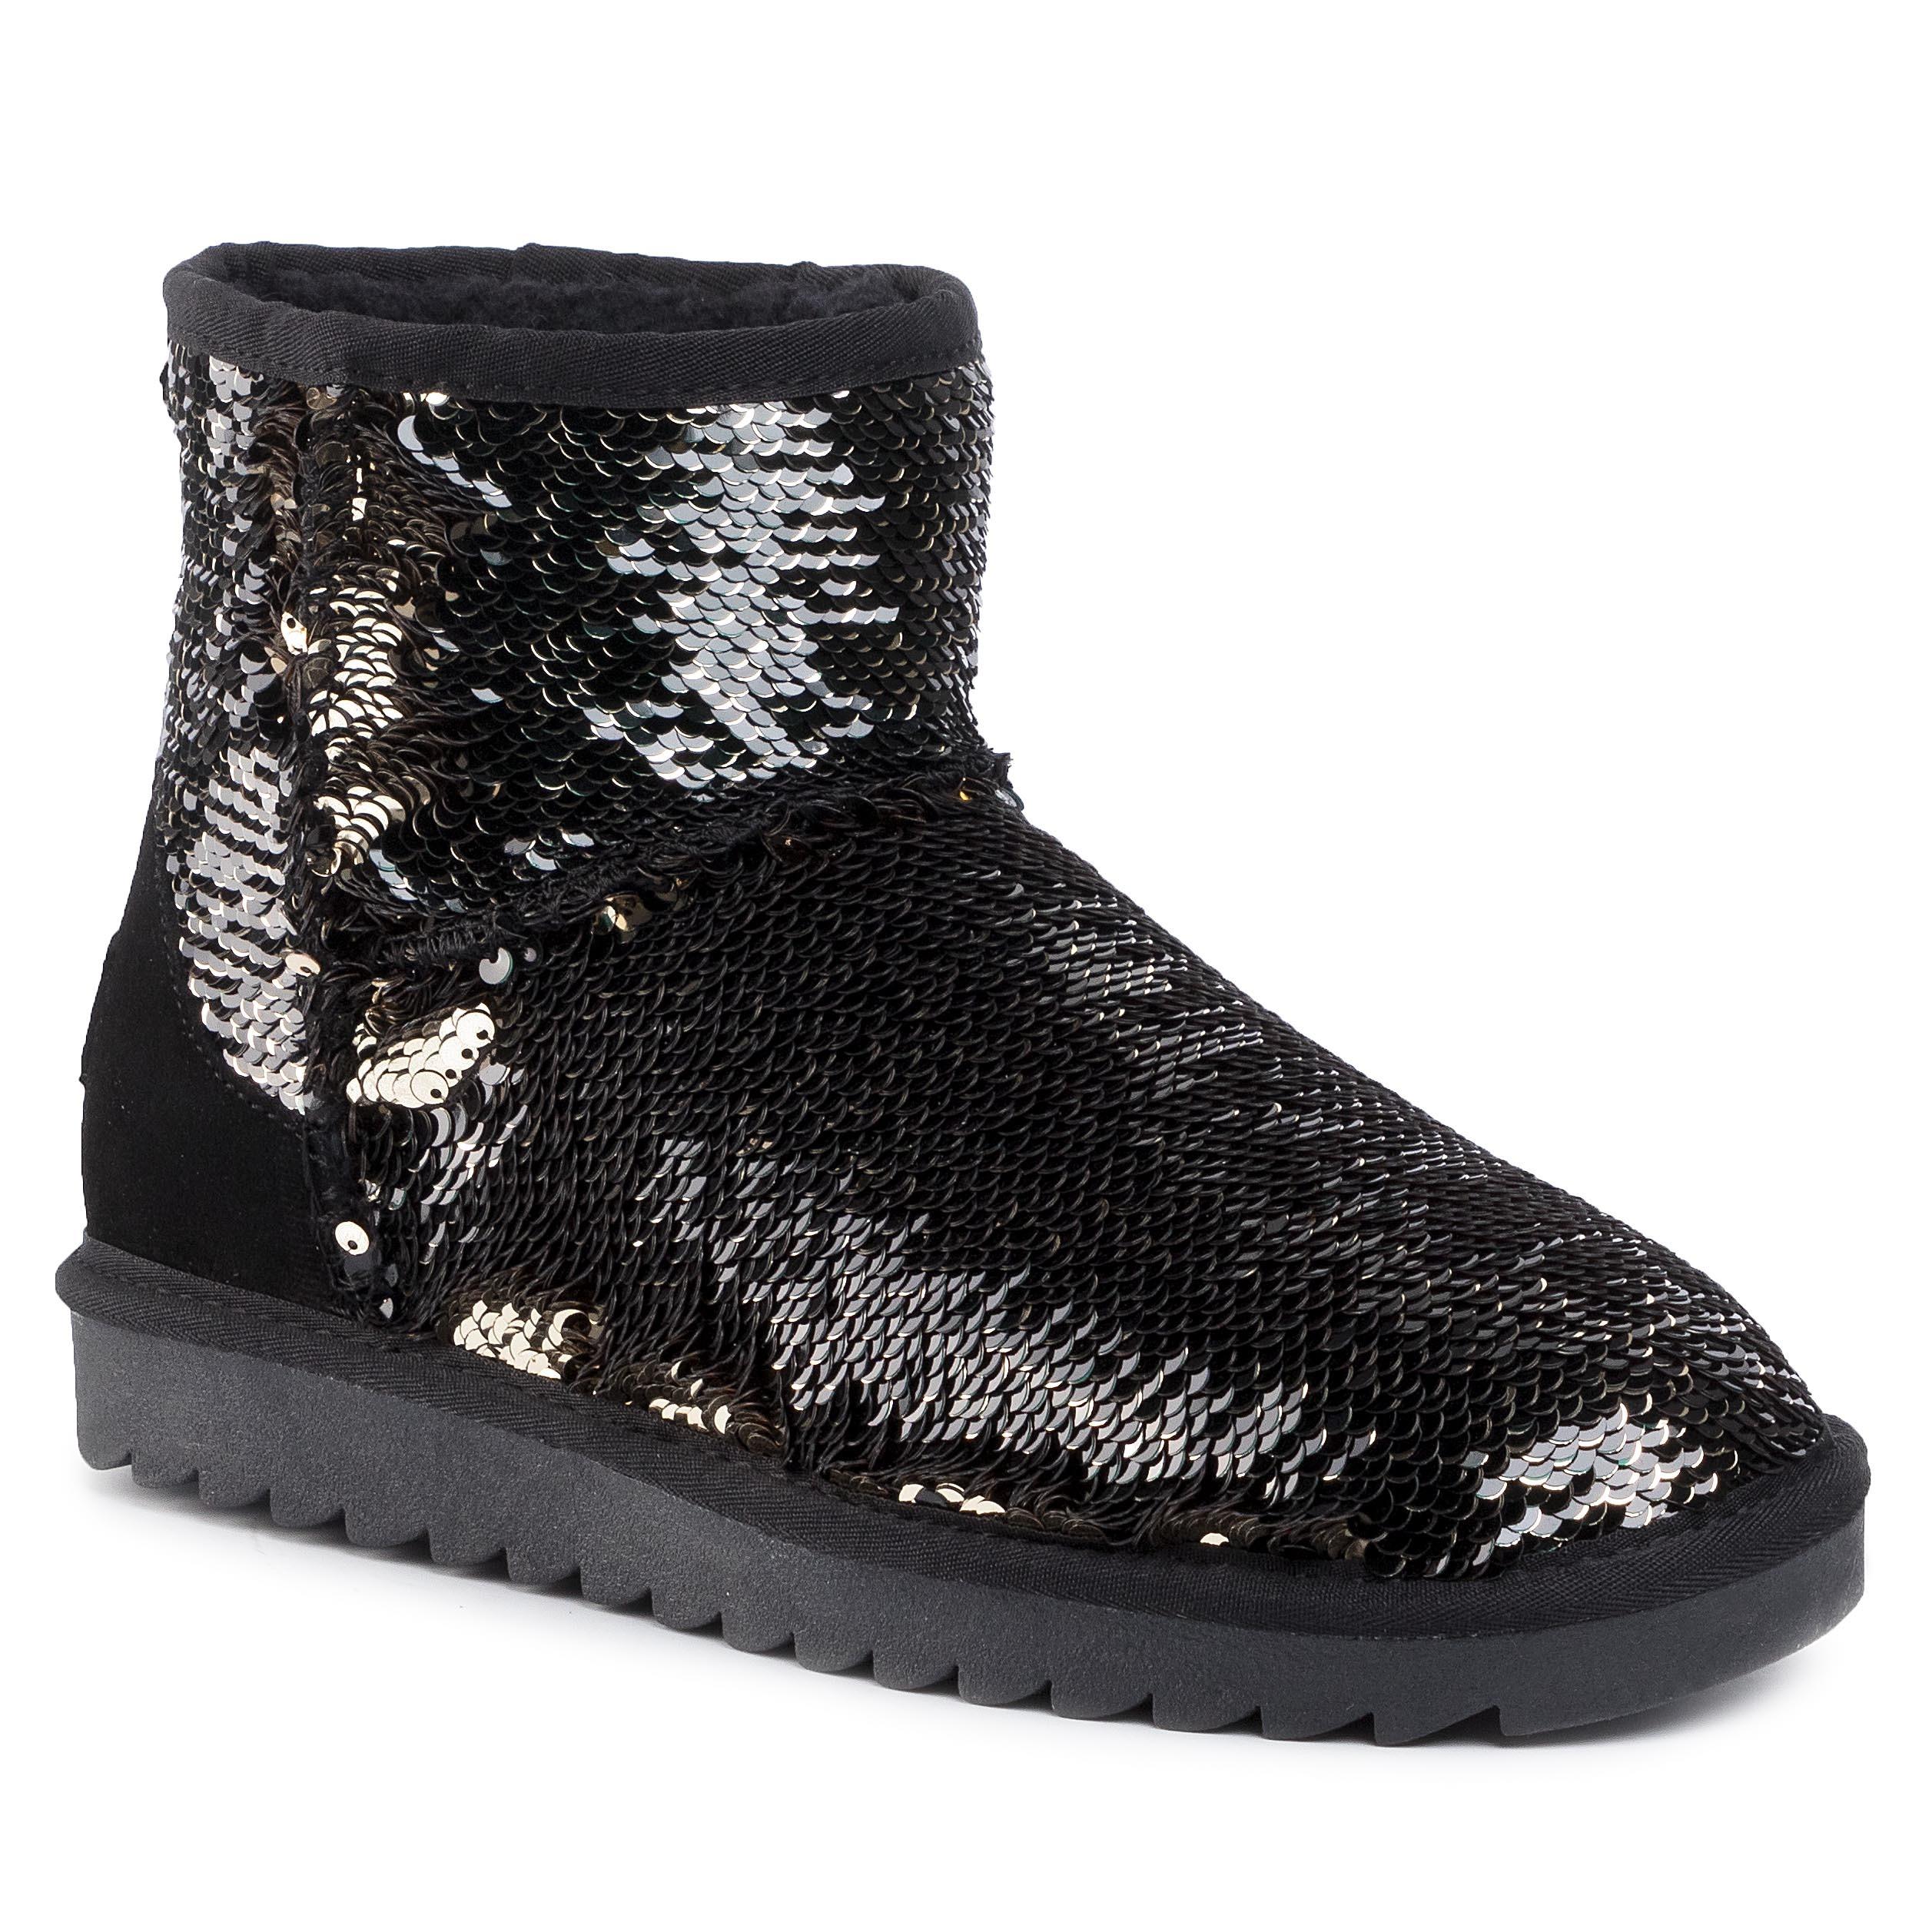 Pantofi COLORS OF CALIFORNIA - HC.YW050 Black